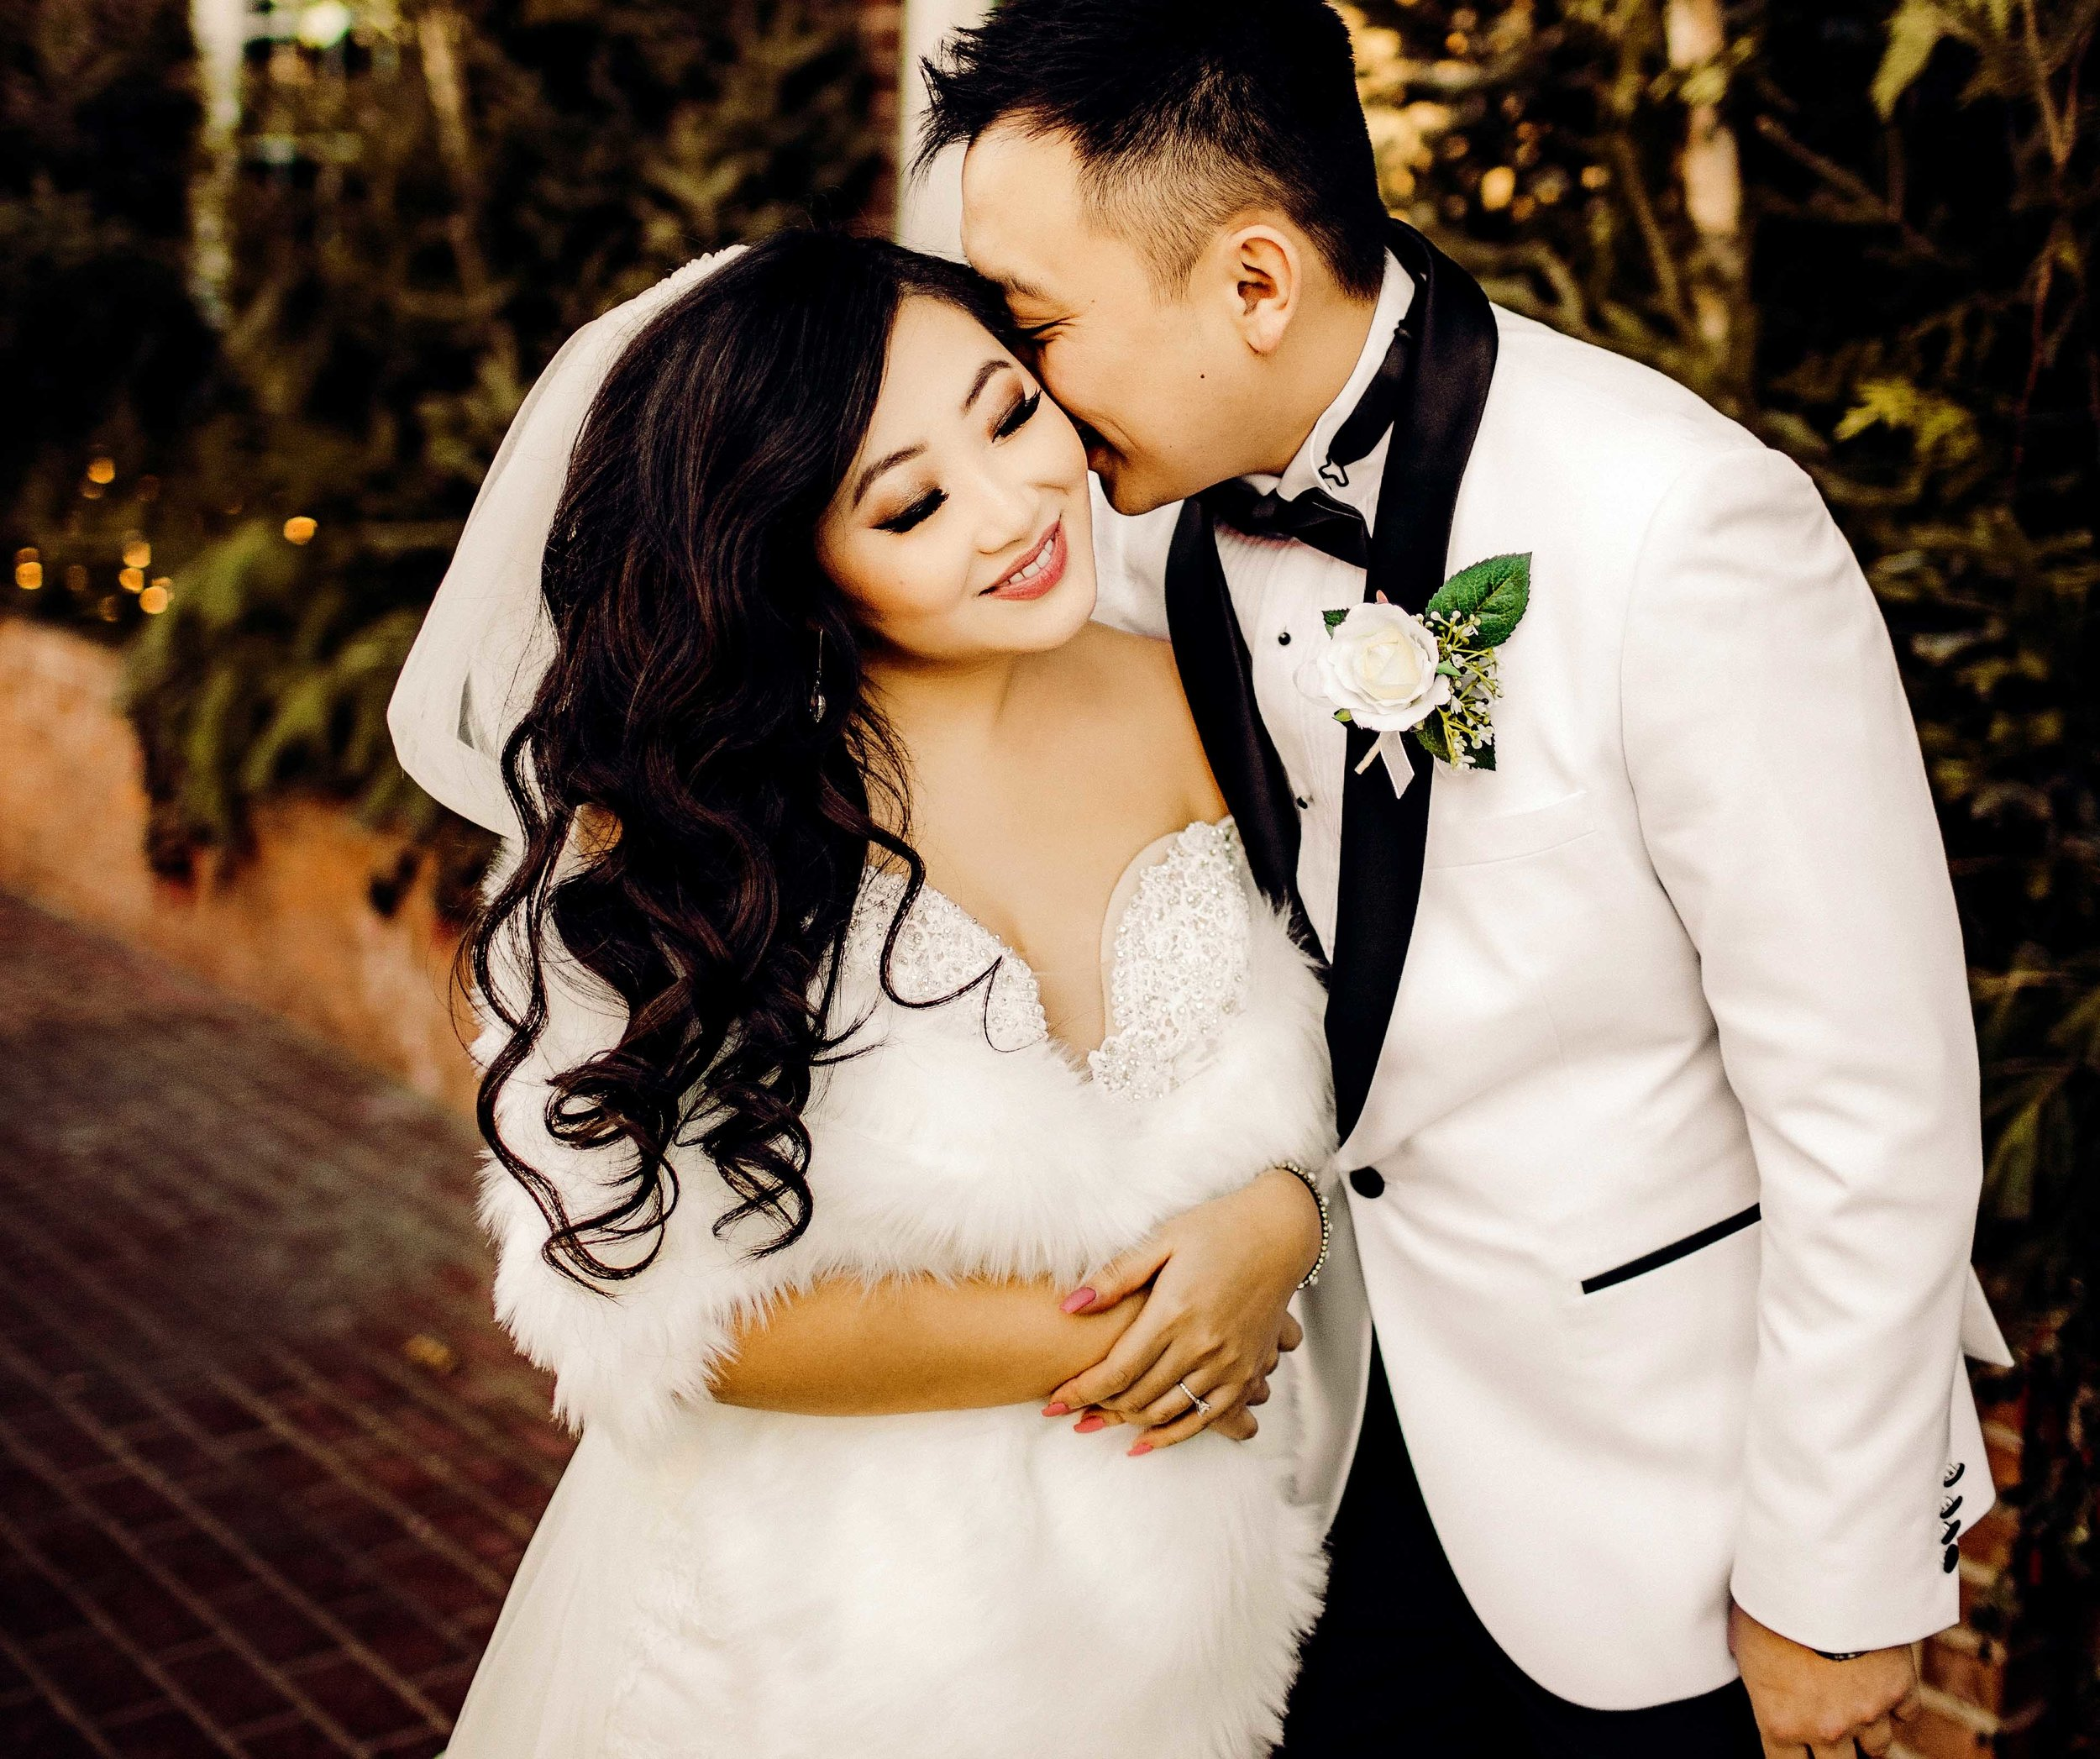 Honey + Yao, Part II, The Bride and Groom-54.jpg